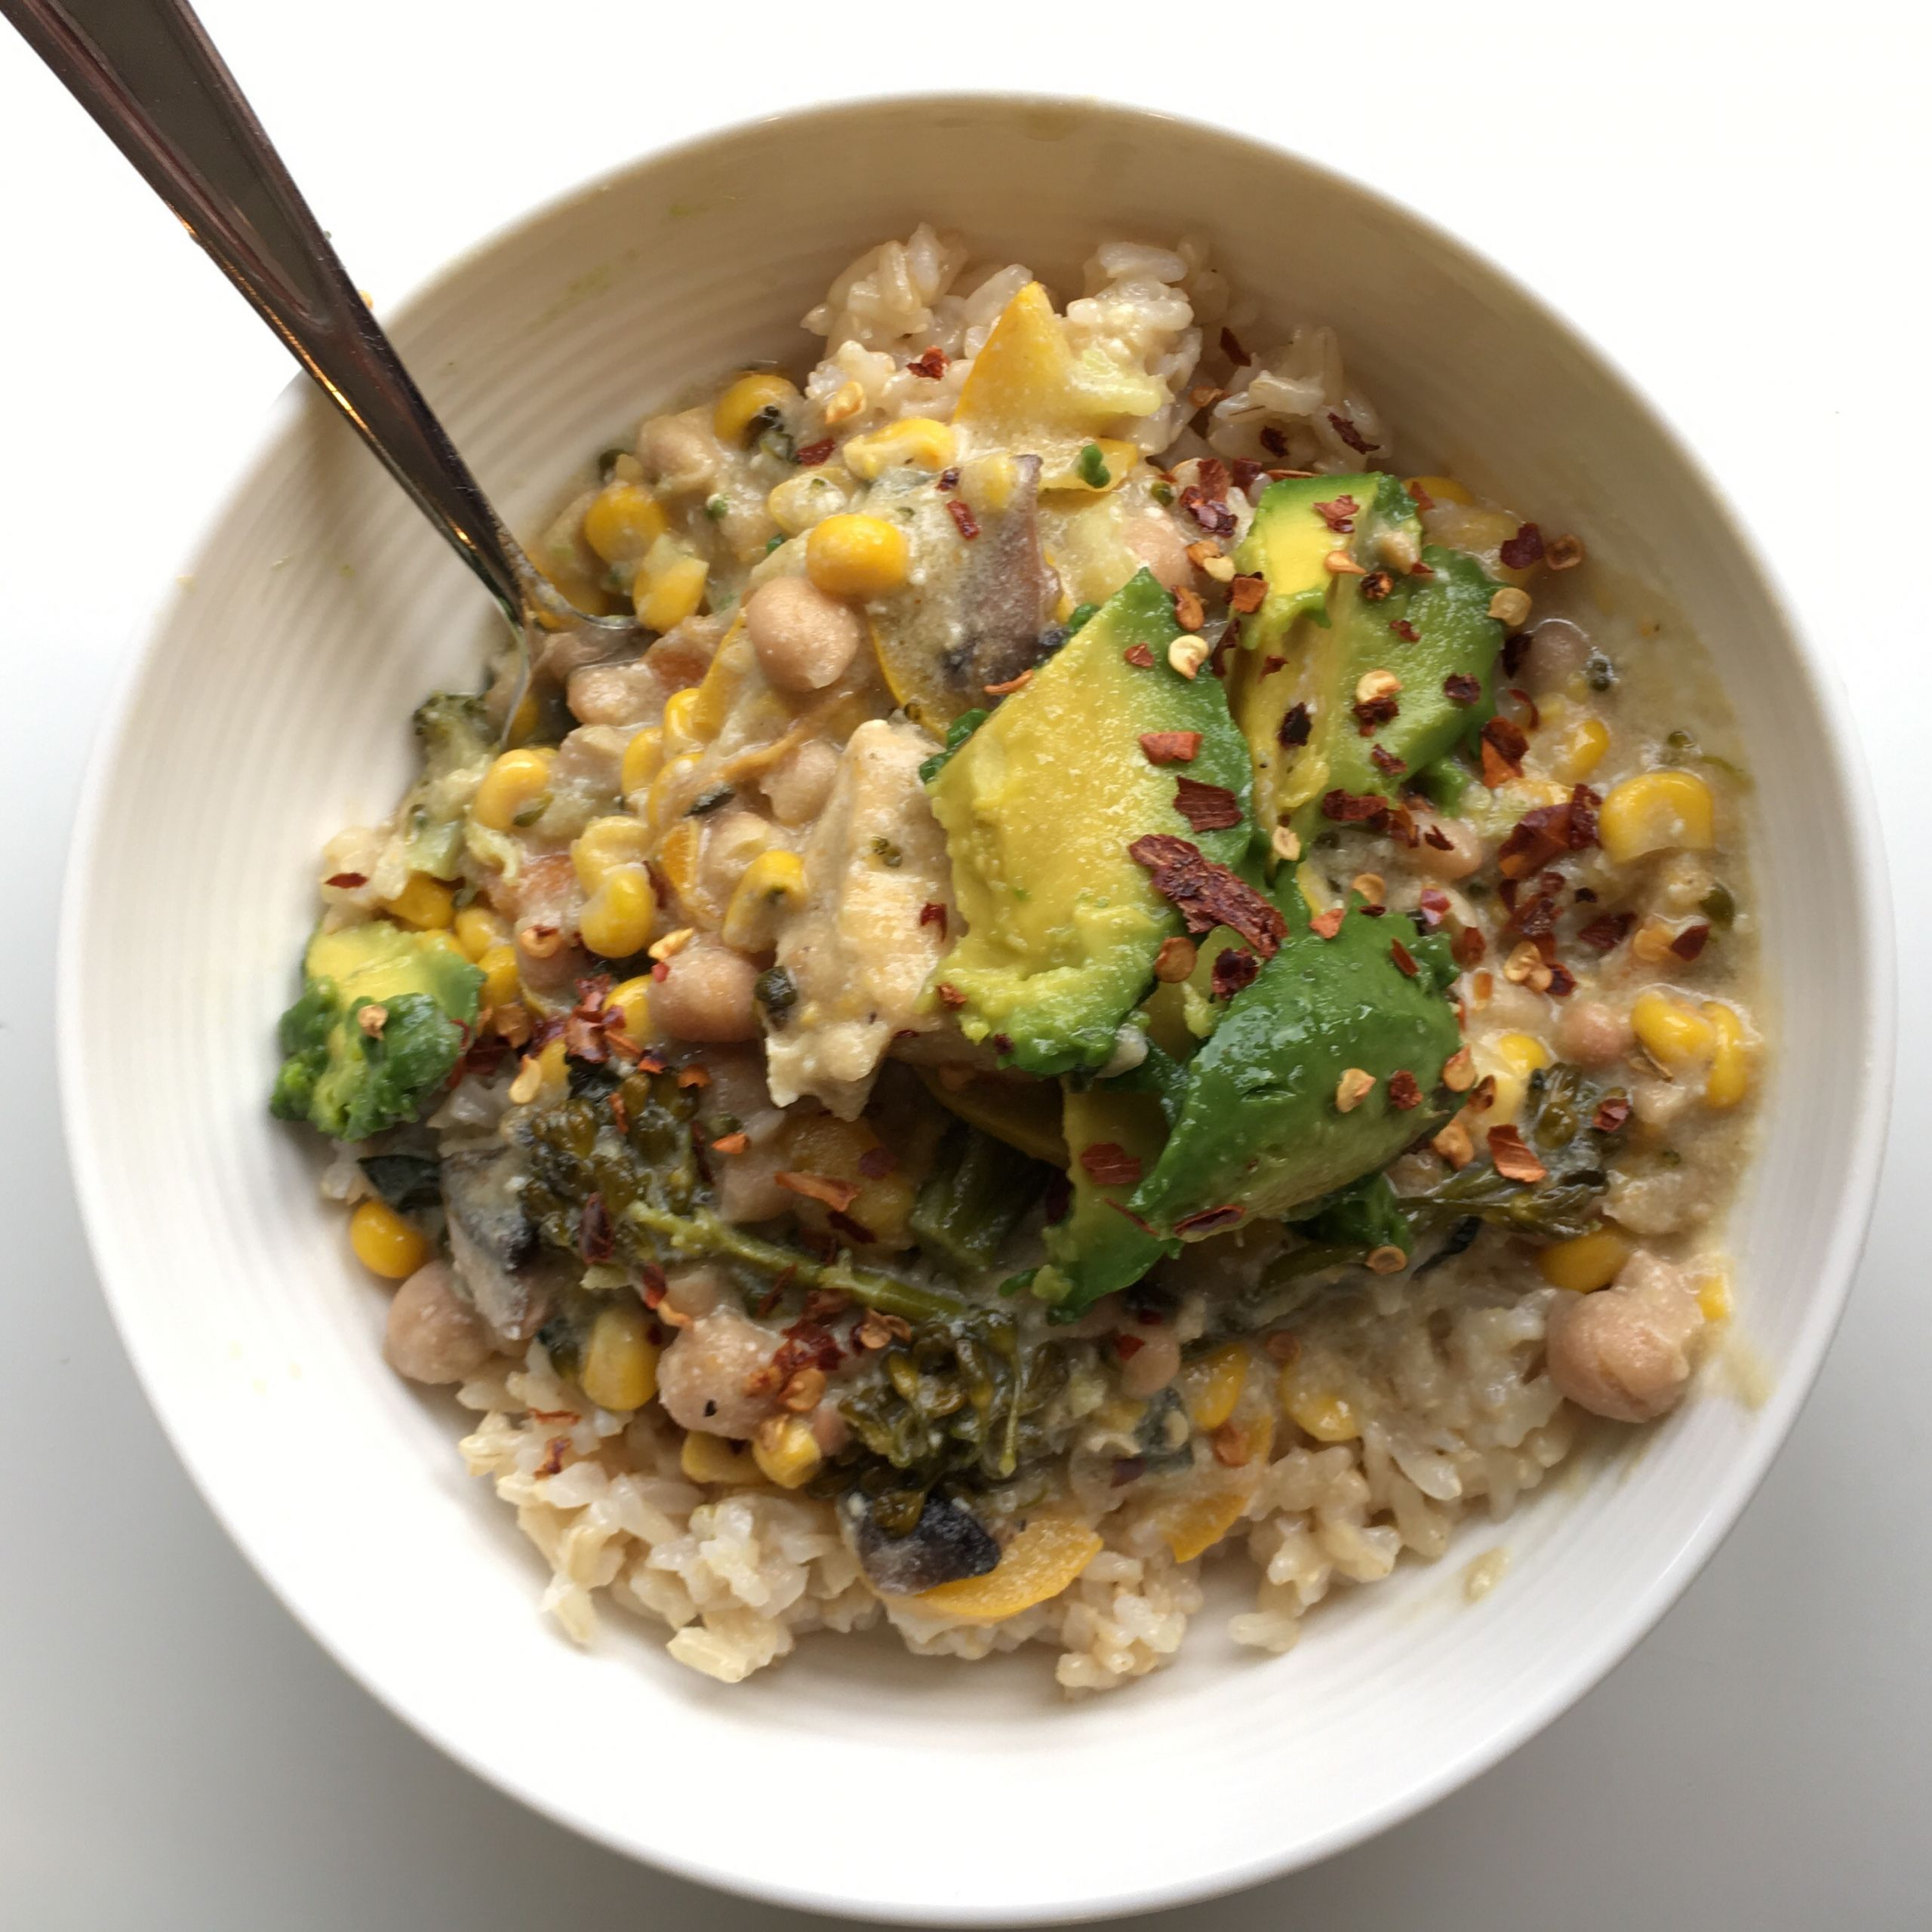 Corn Chowder Vegetarian  ve arian corn chowder